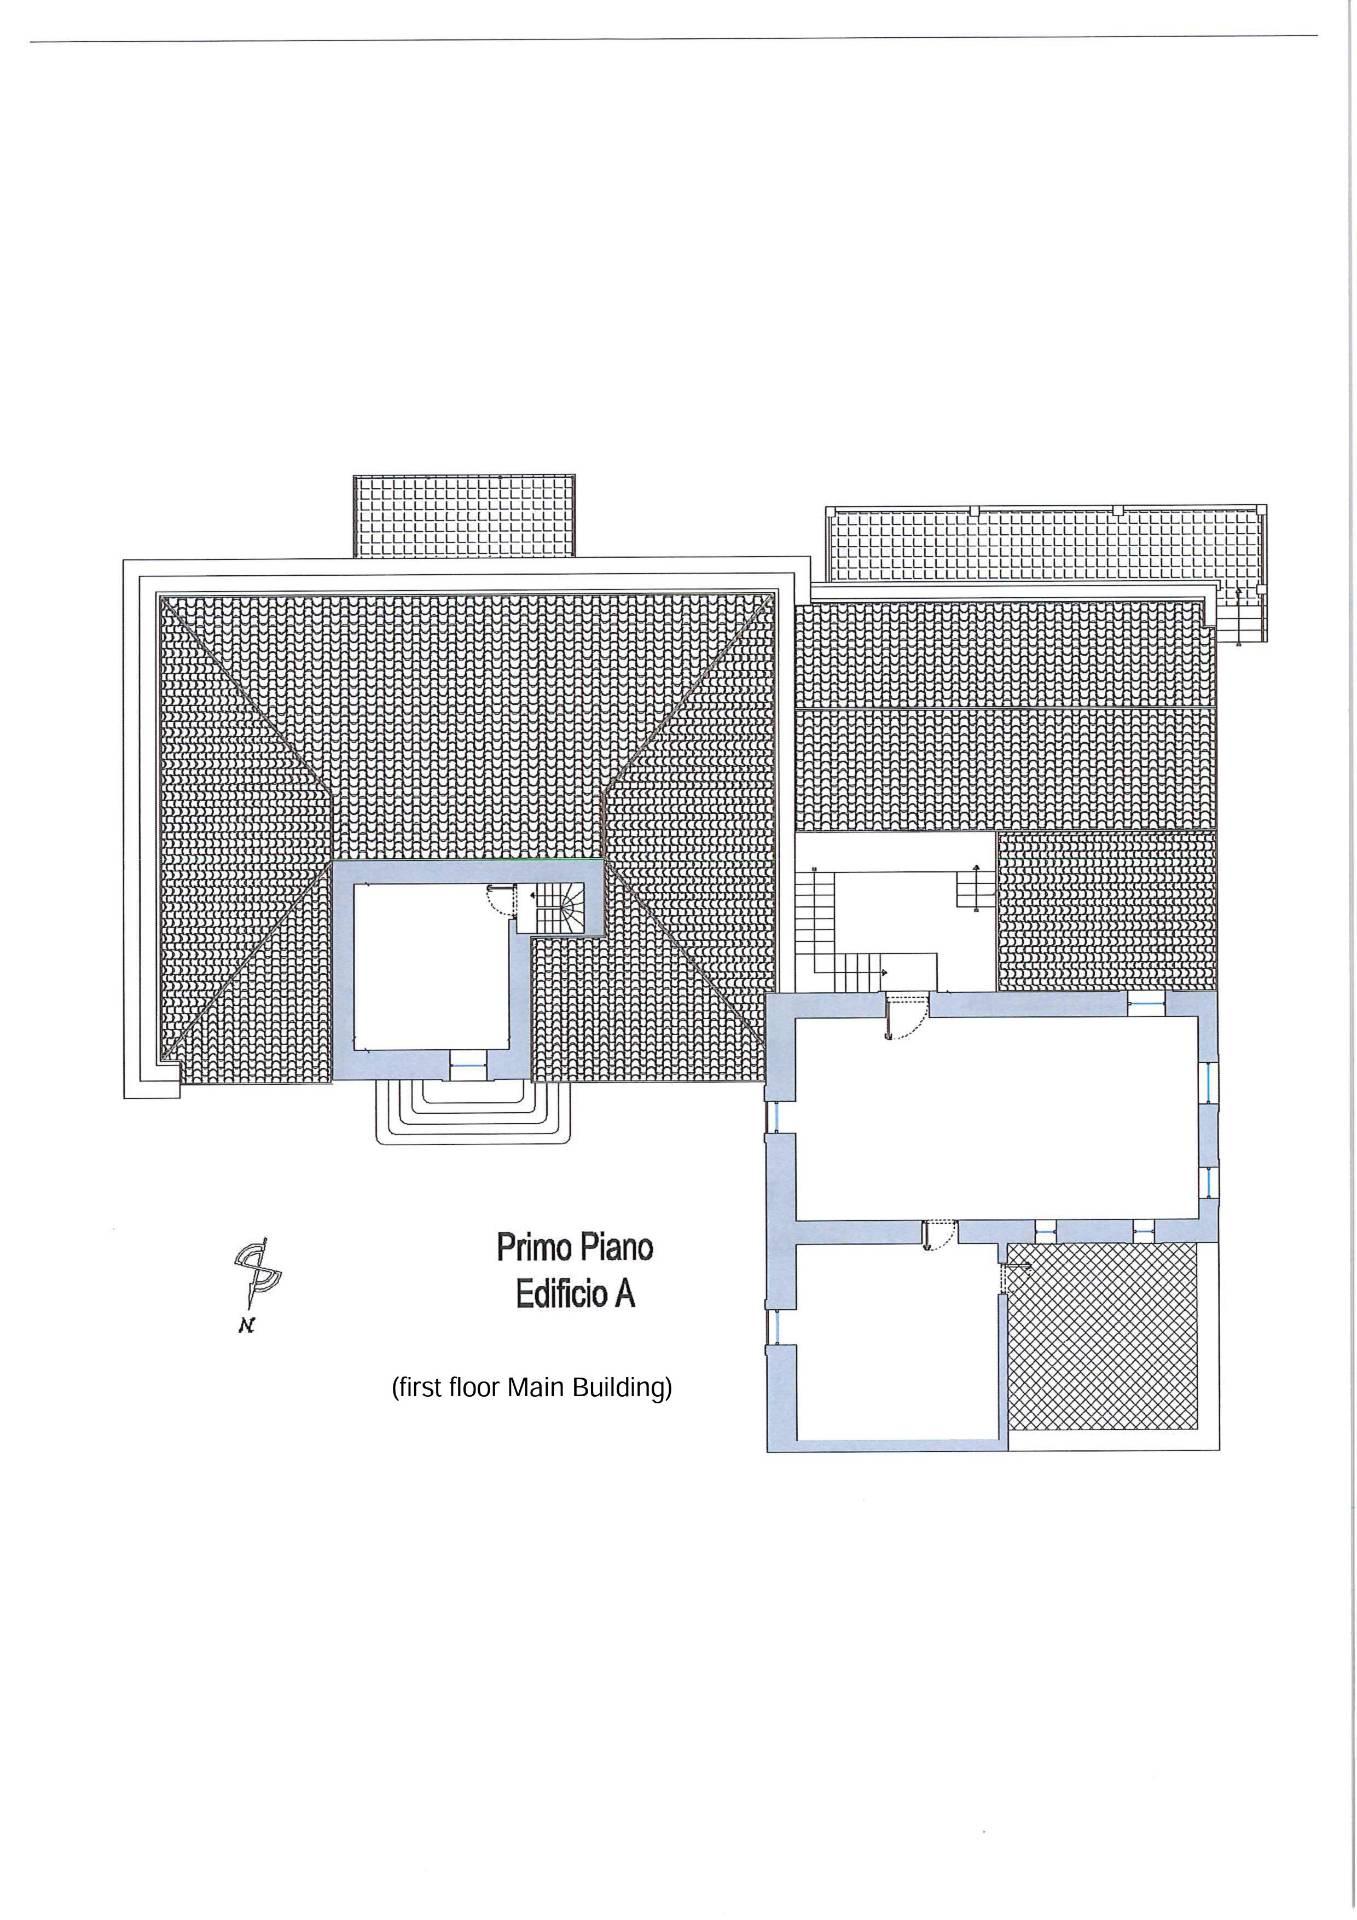 Casa indipendente in Vendita a Noto: 5 locali, 1000 mq - Foto 21